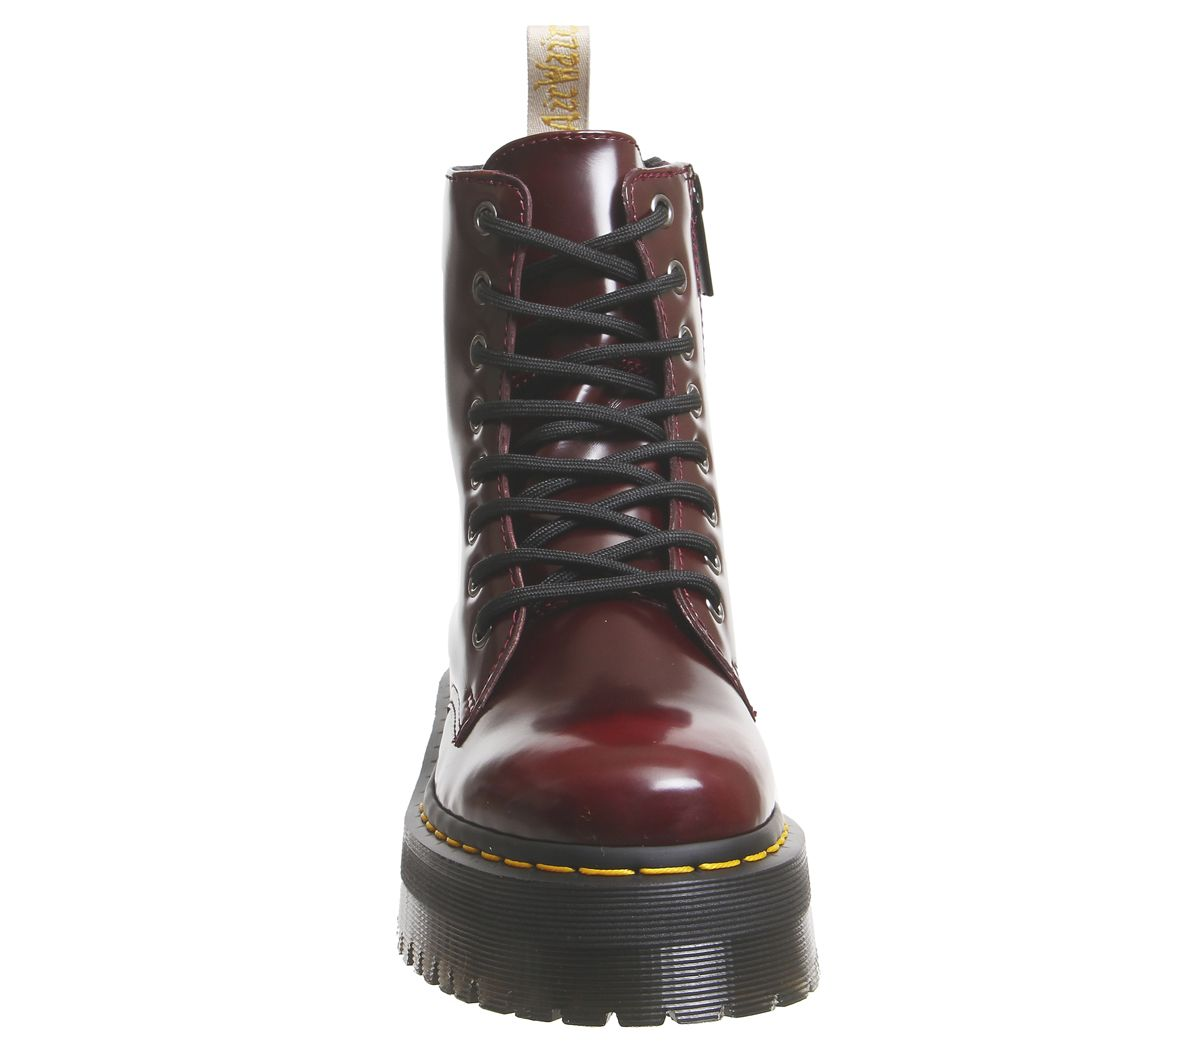 8ef69fe91d1 Womens Dr. Martens V Jadon 8 Eye Boots Cherry Red Boots